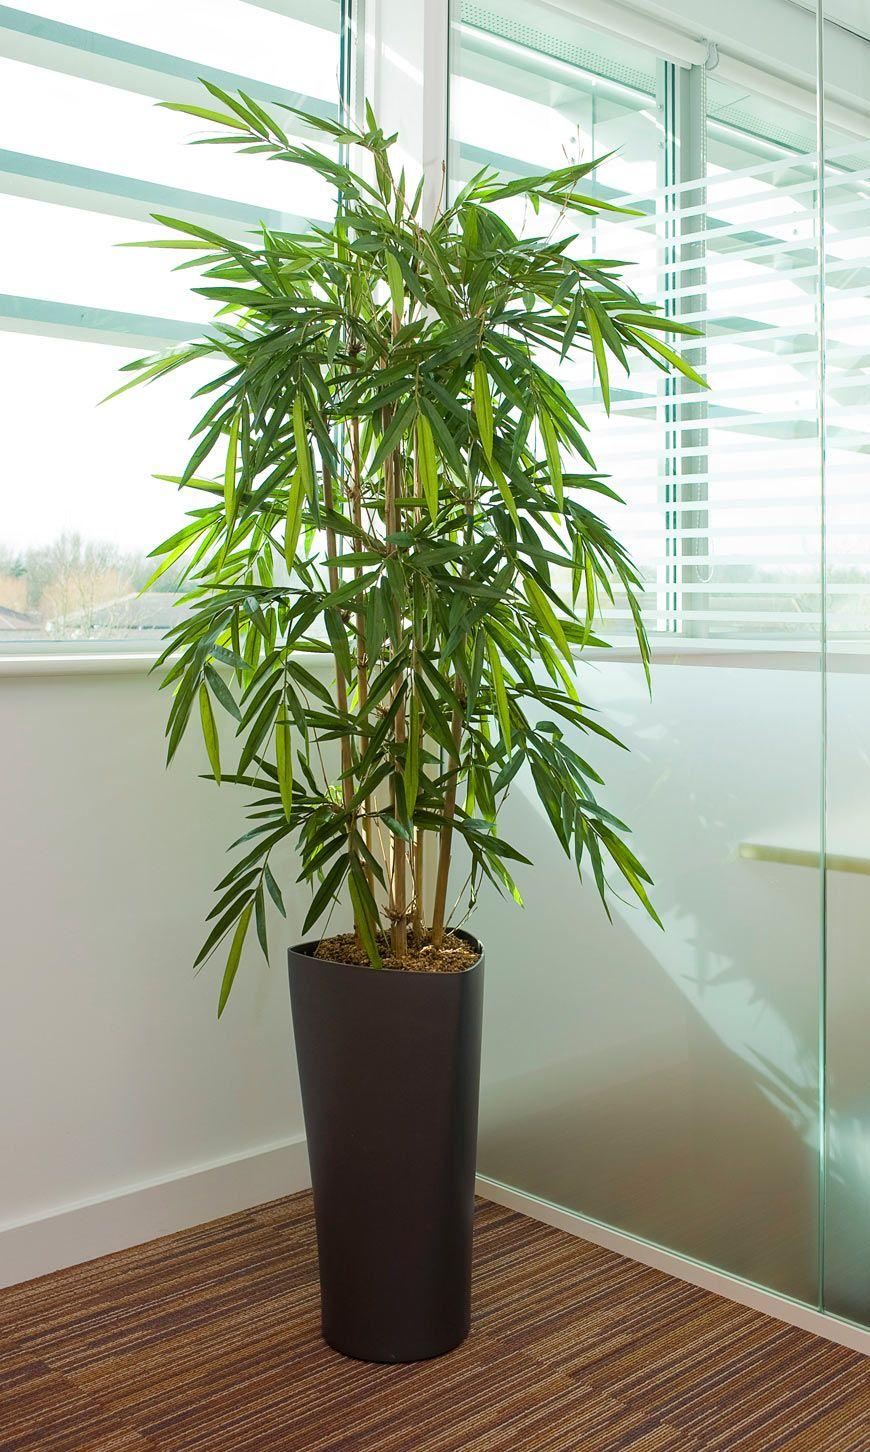 Artificial Bamboo In Delta Pot Artificial Plants Indoor Small Artificial Plants Artificial Plant Wall